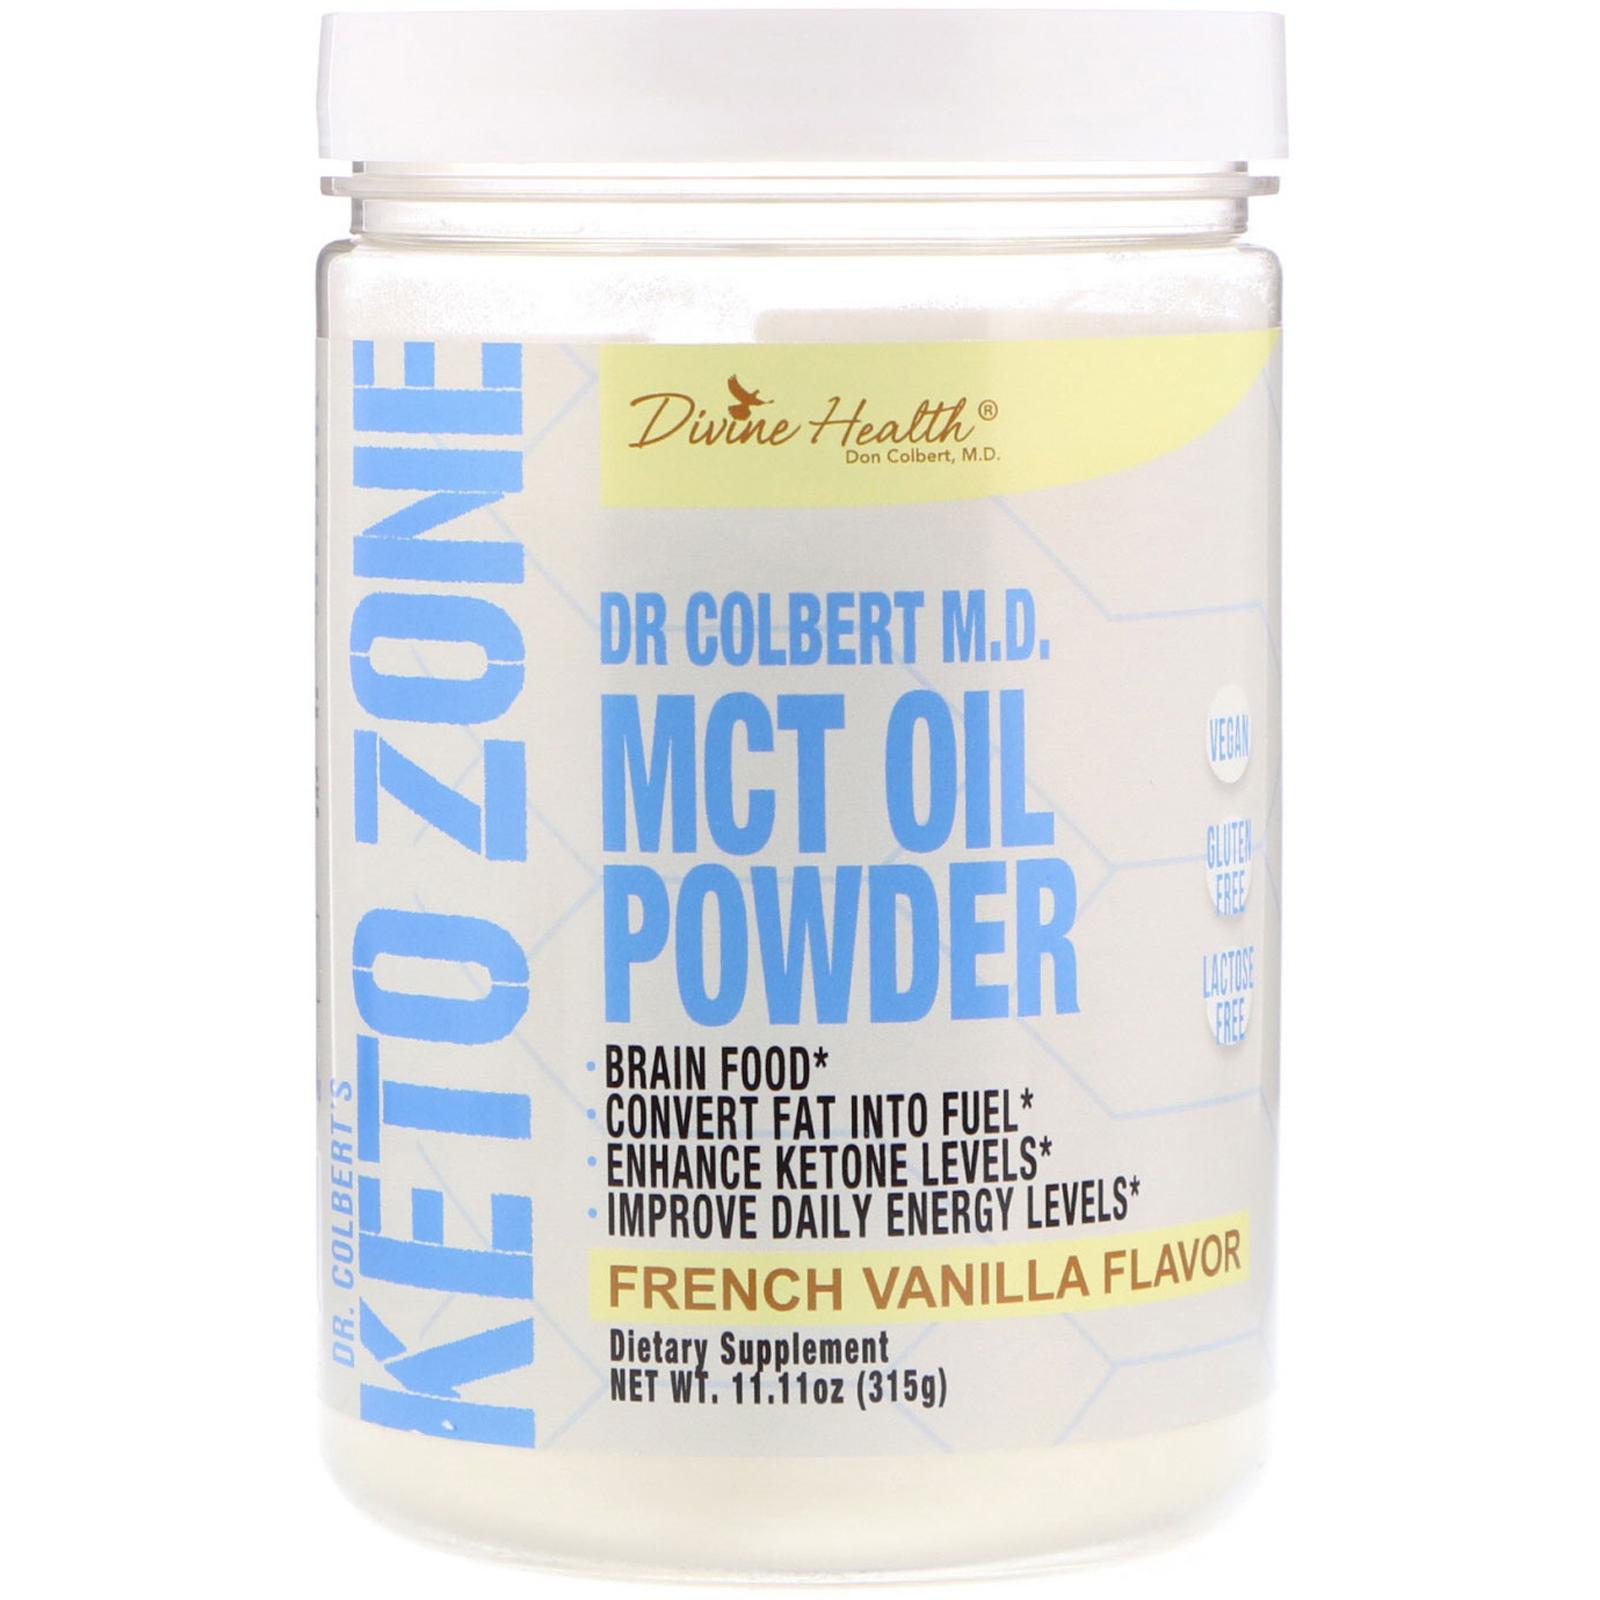 Divine Health Dr Colbert S Keto Zone Mct Oil Powder French